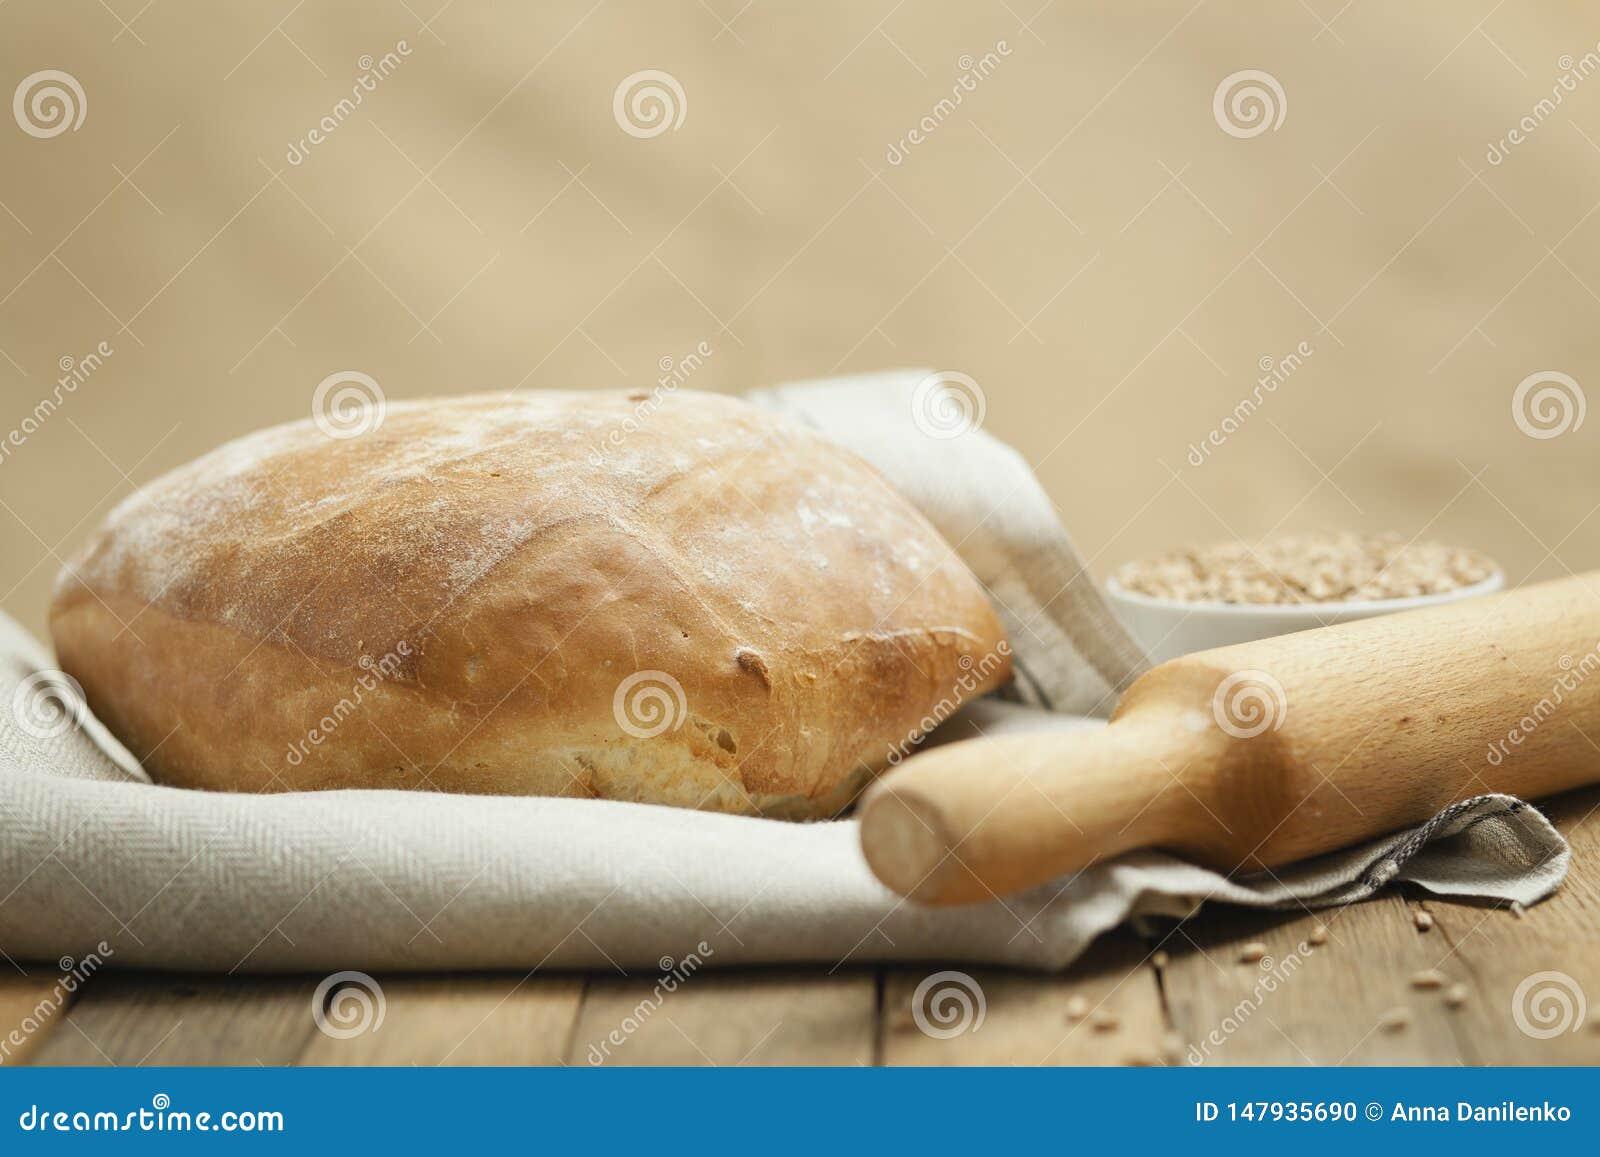 Lush bread on a towel